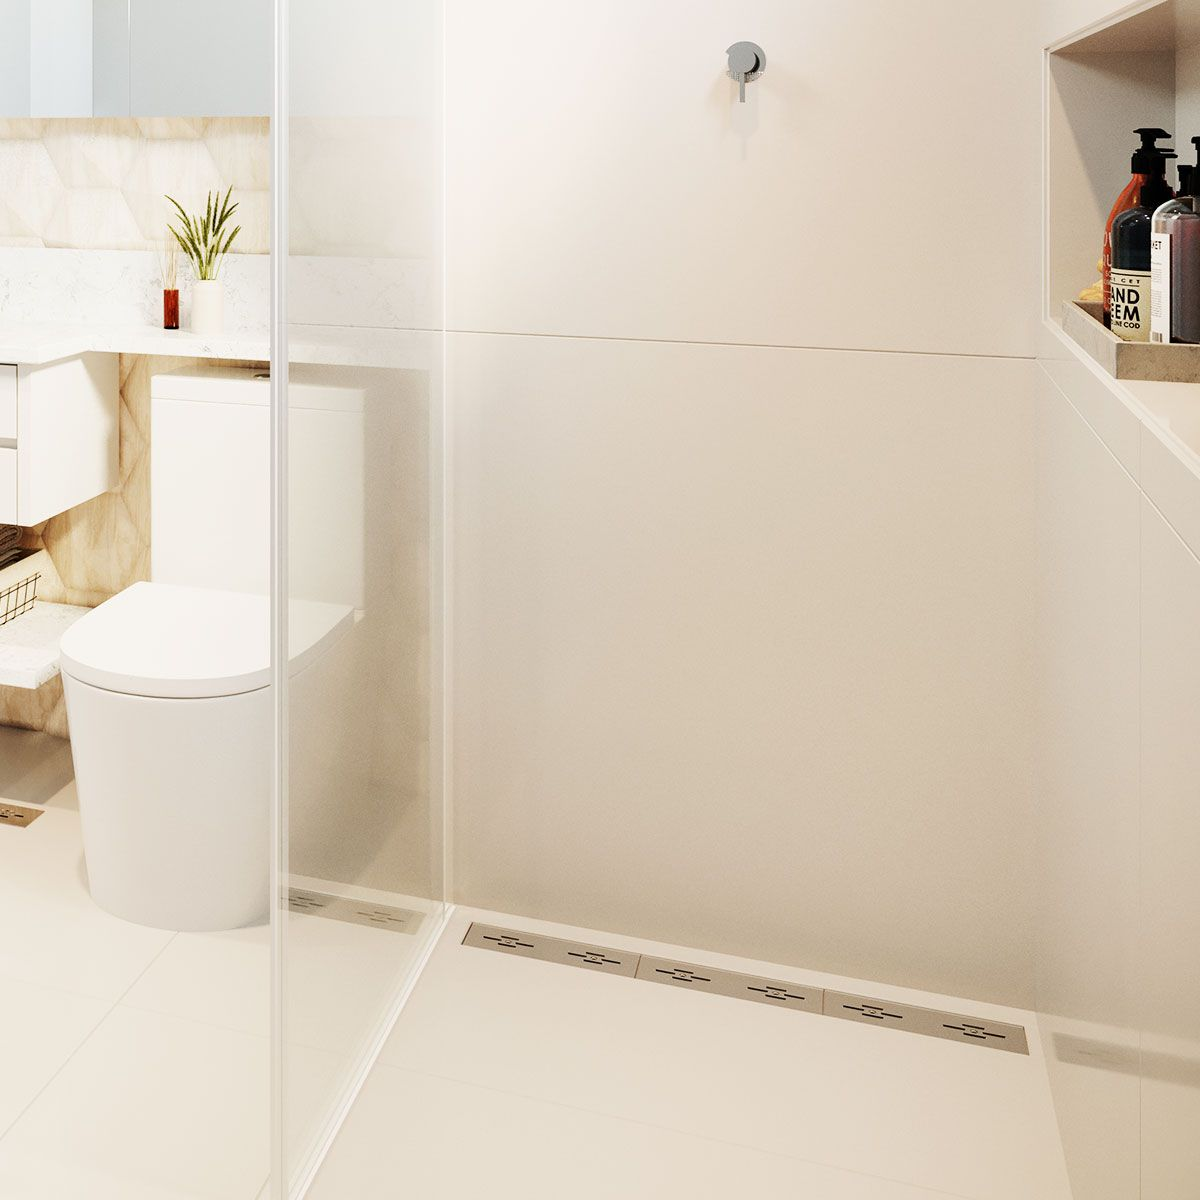 Ralo Linear Banheiro Novii 75cm PVC - Seco ou Sifonado